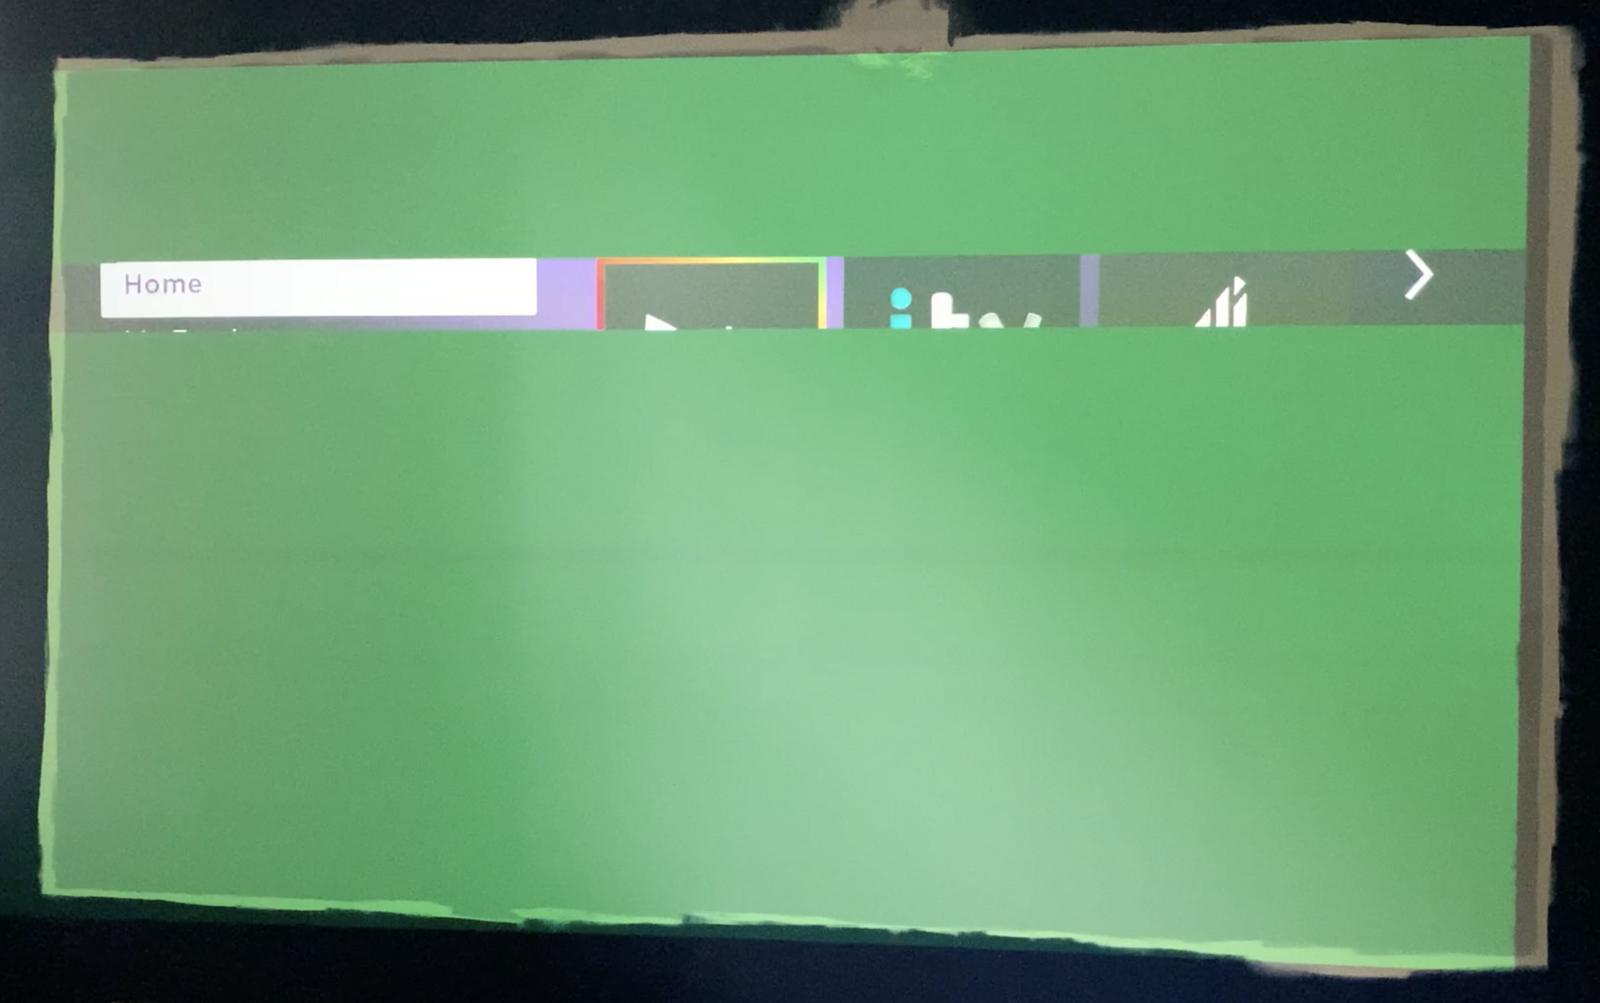 HDCP-greenscreen.png